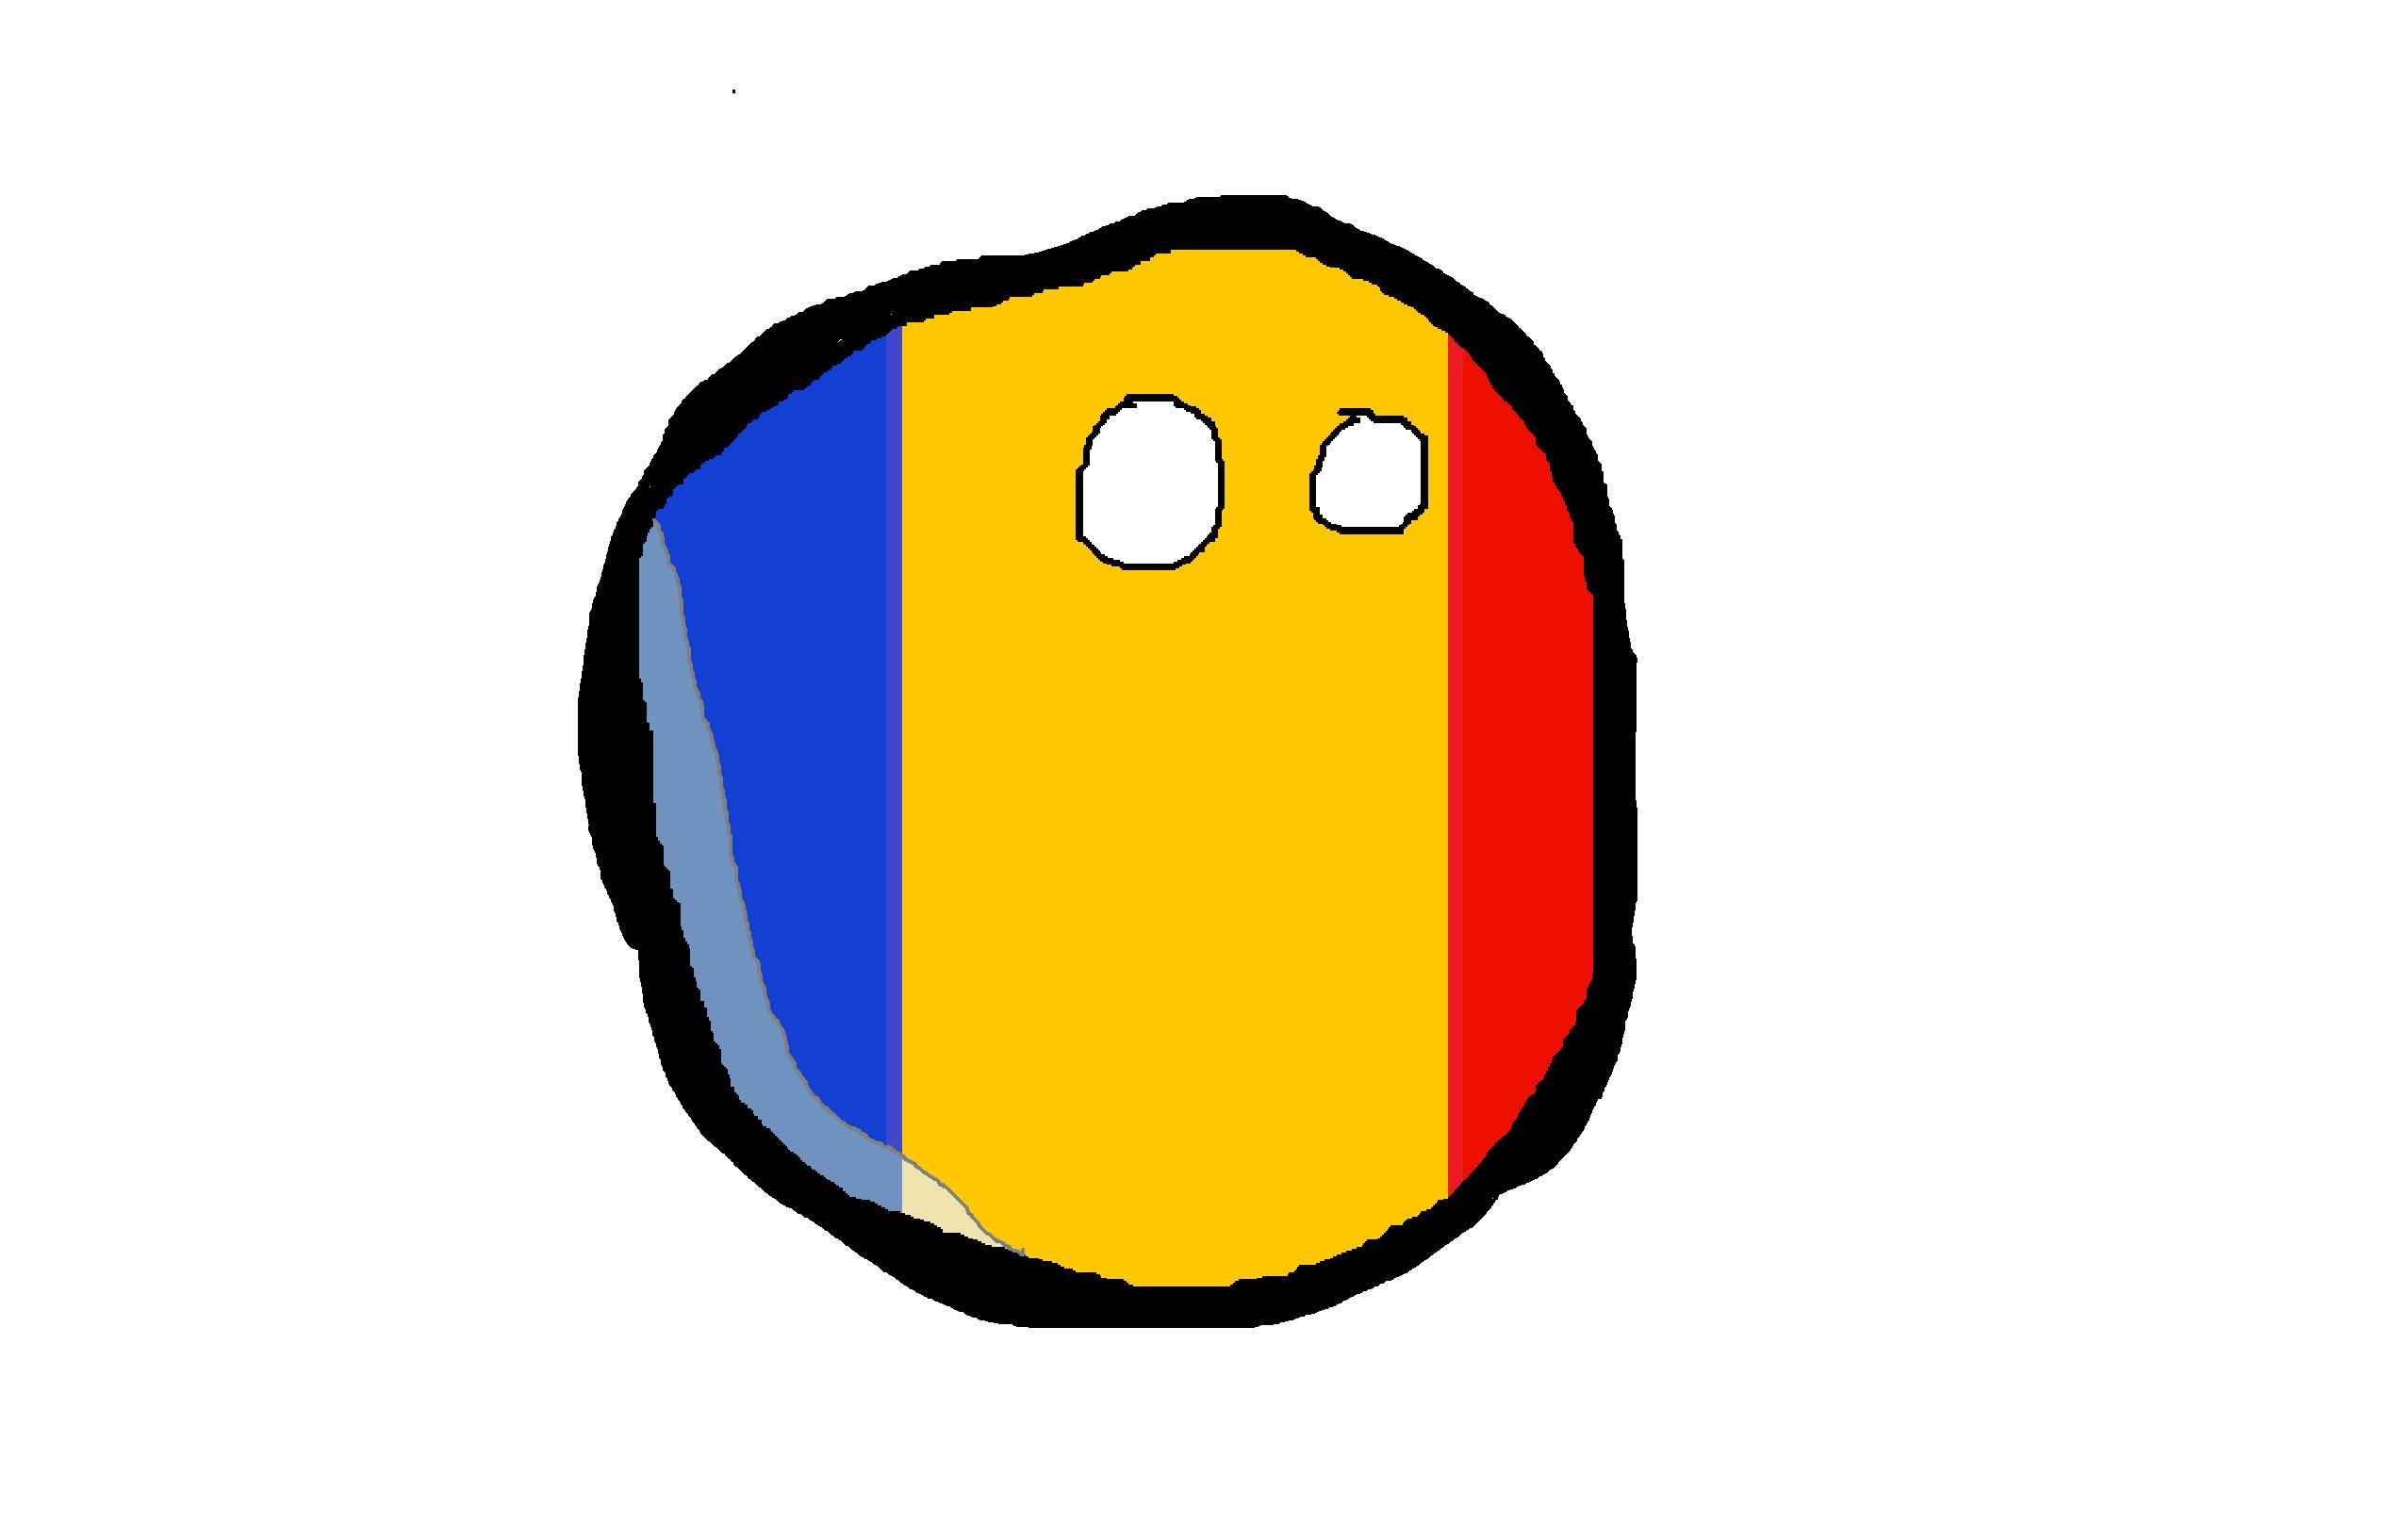 Parthenopean Republicball